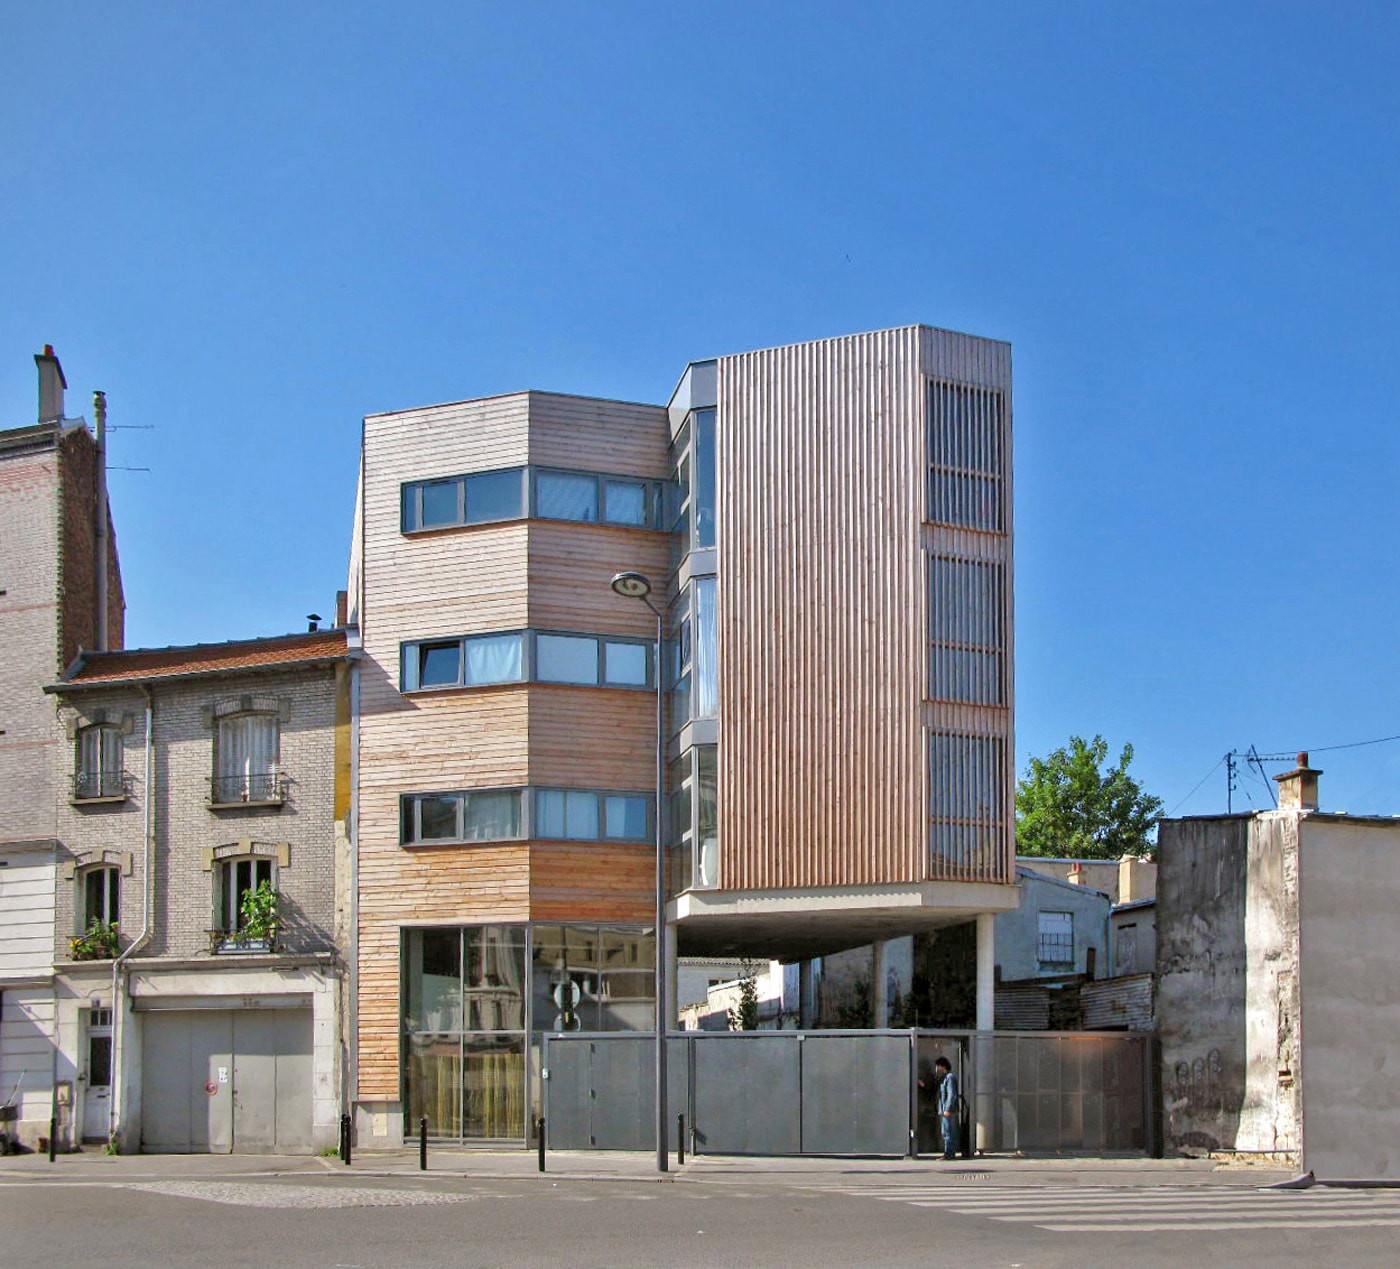 graam-diwan-01-logements-montreuil-exterieur-bardage-bois-rue